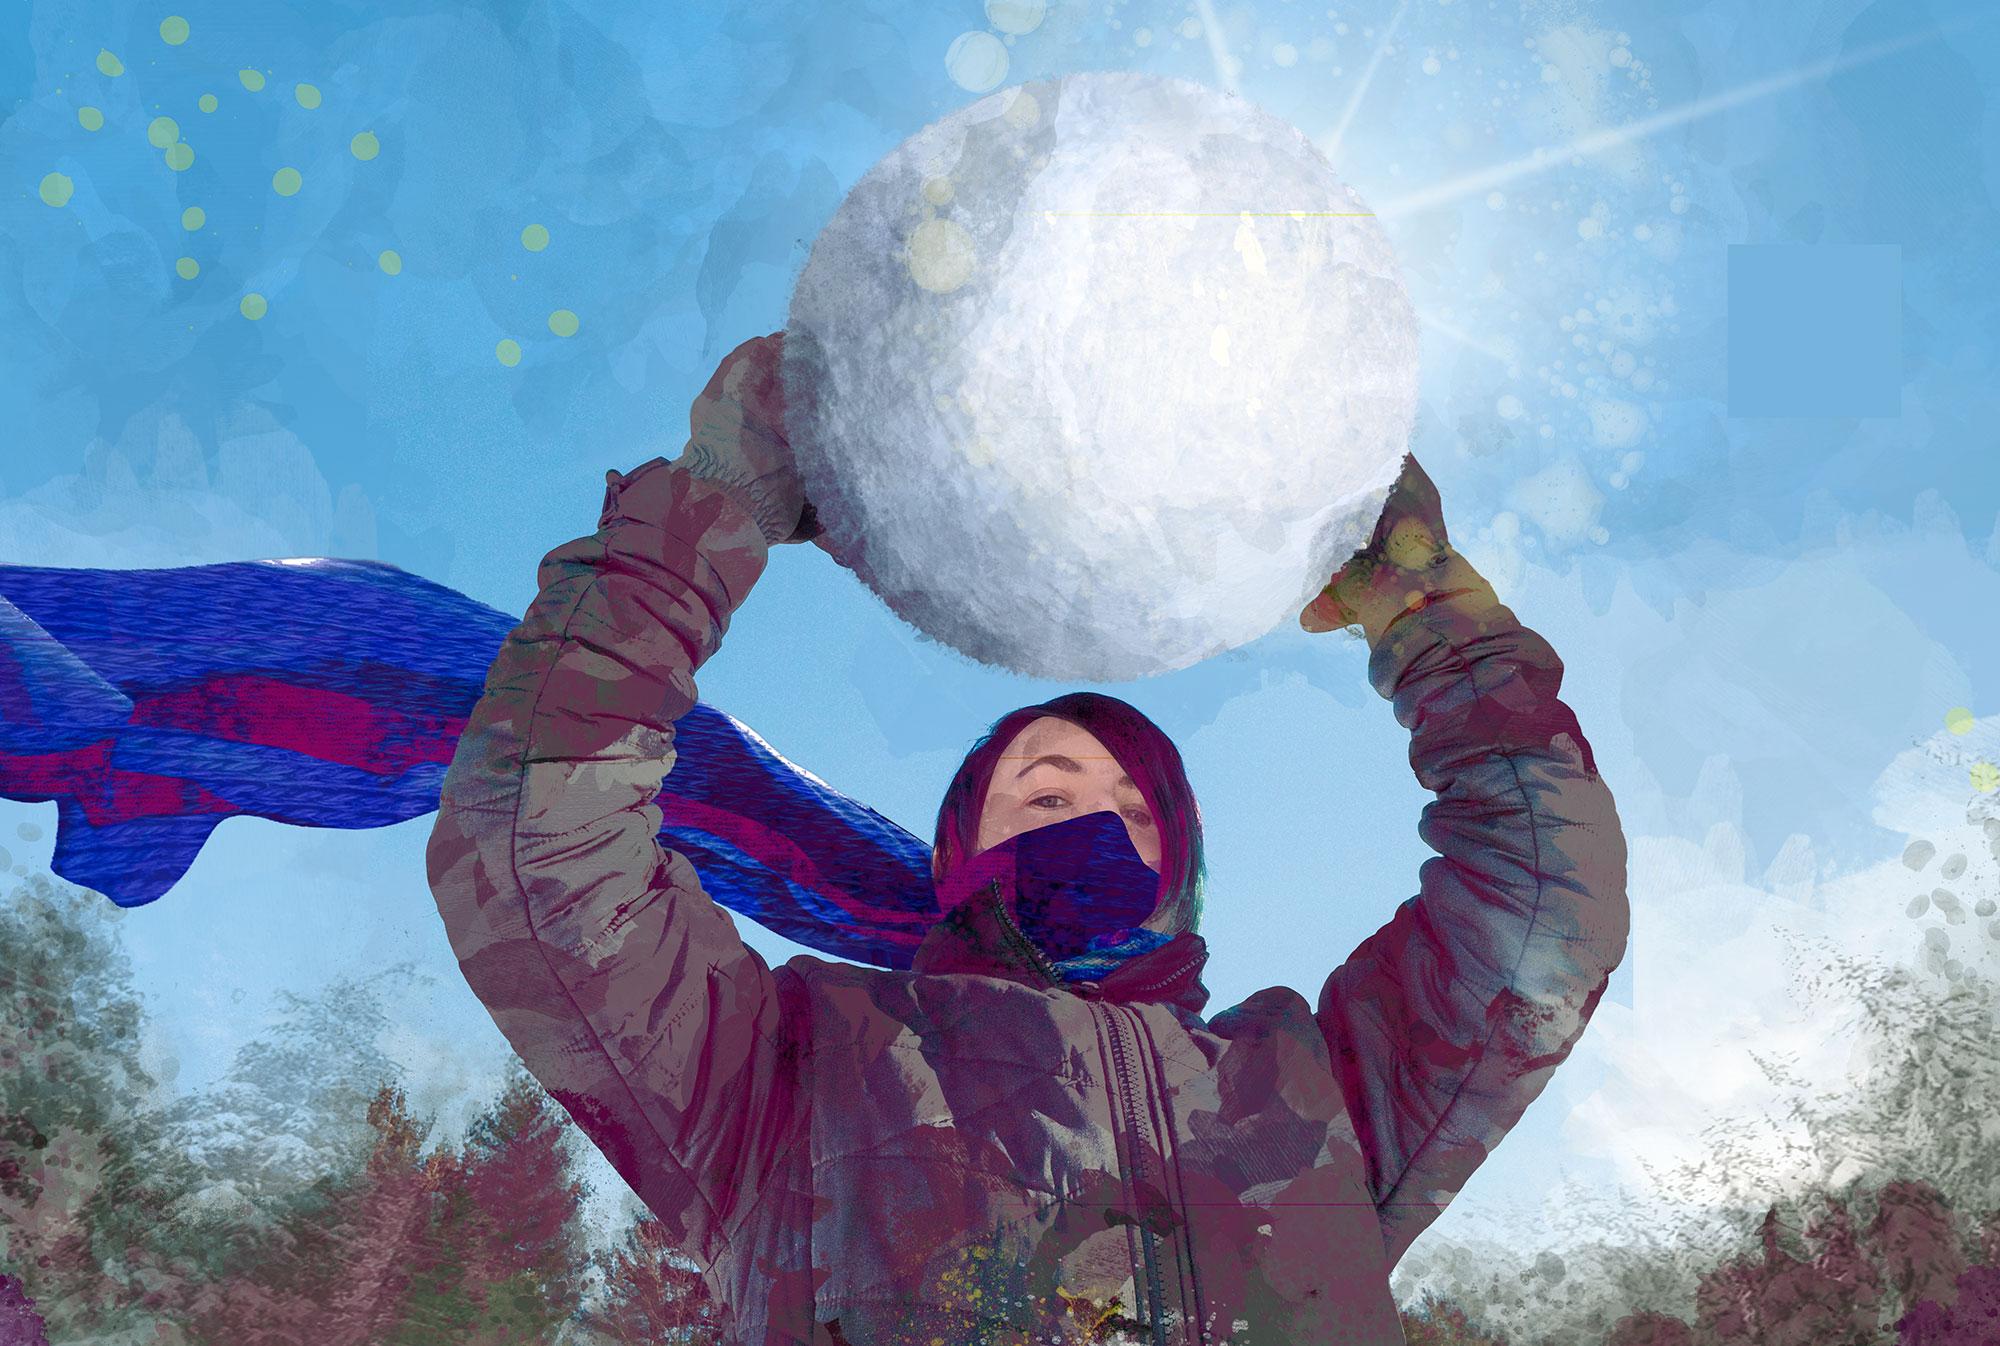 Big_Snowball